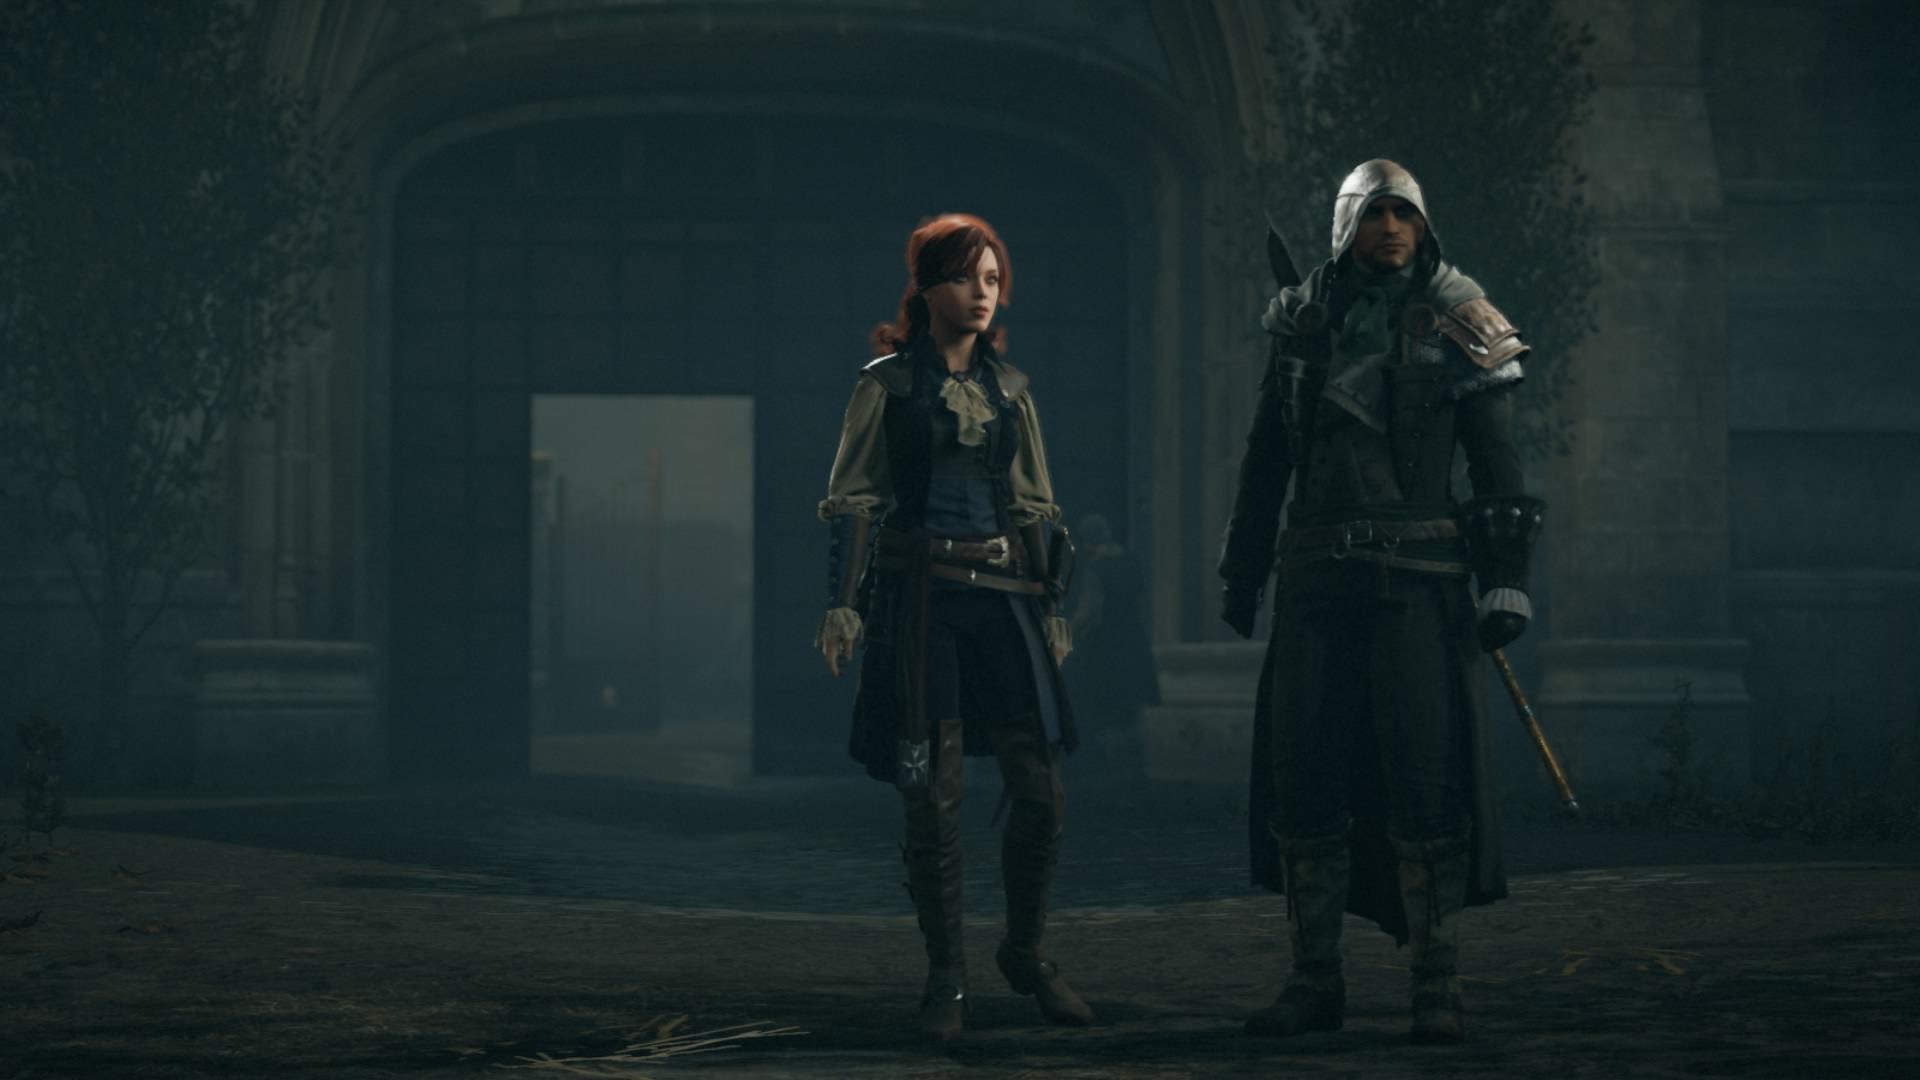 Assassin S Creed Unity Arno And Elise 3 By Treepish On Deviantart